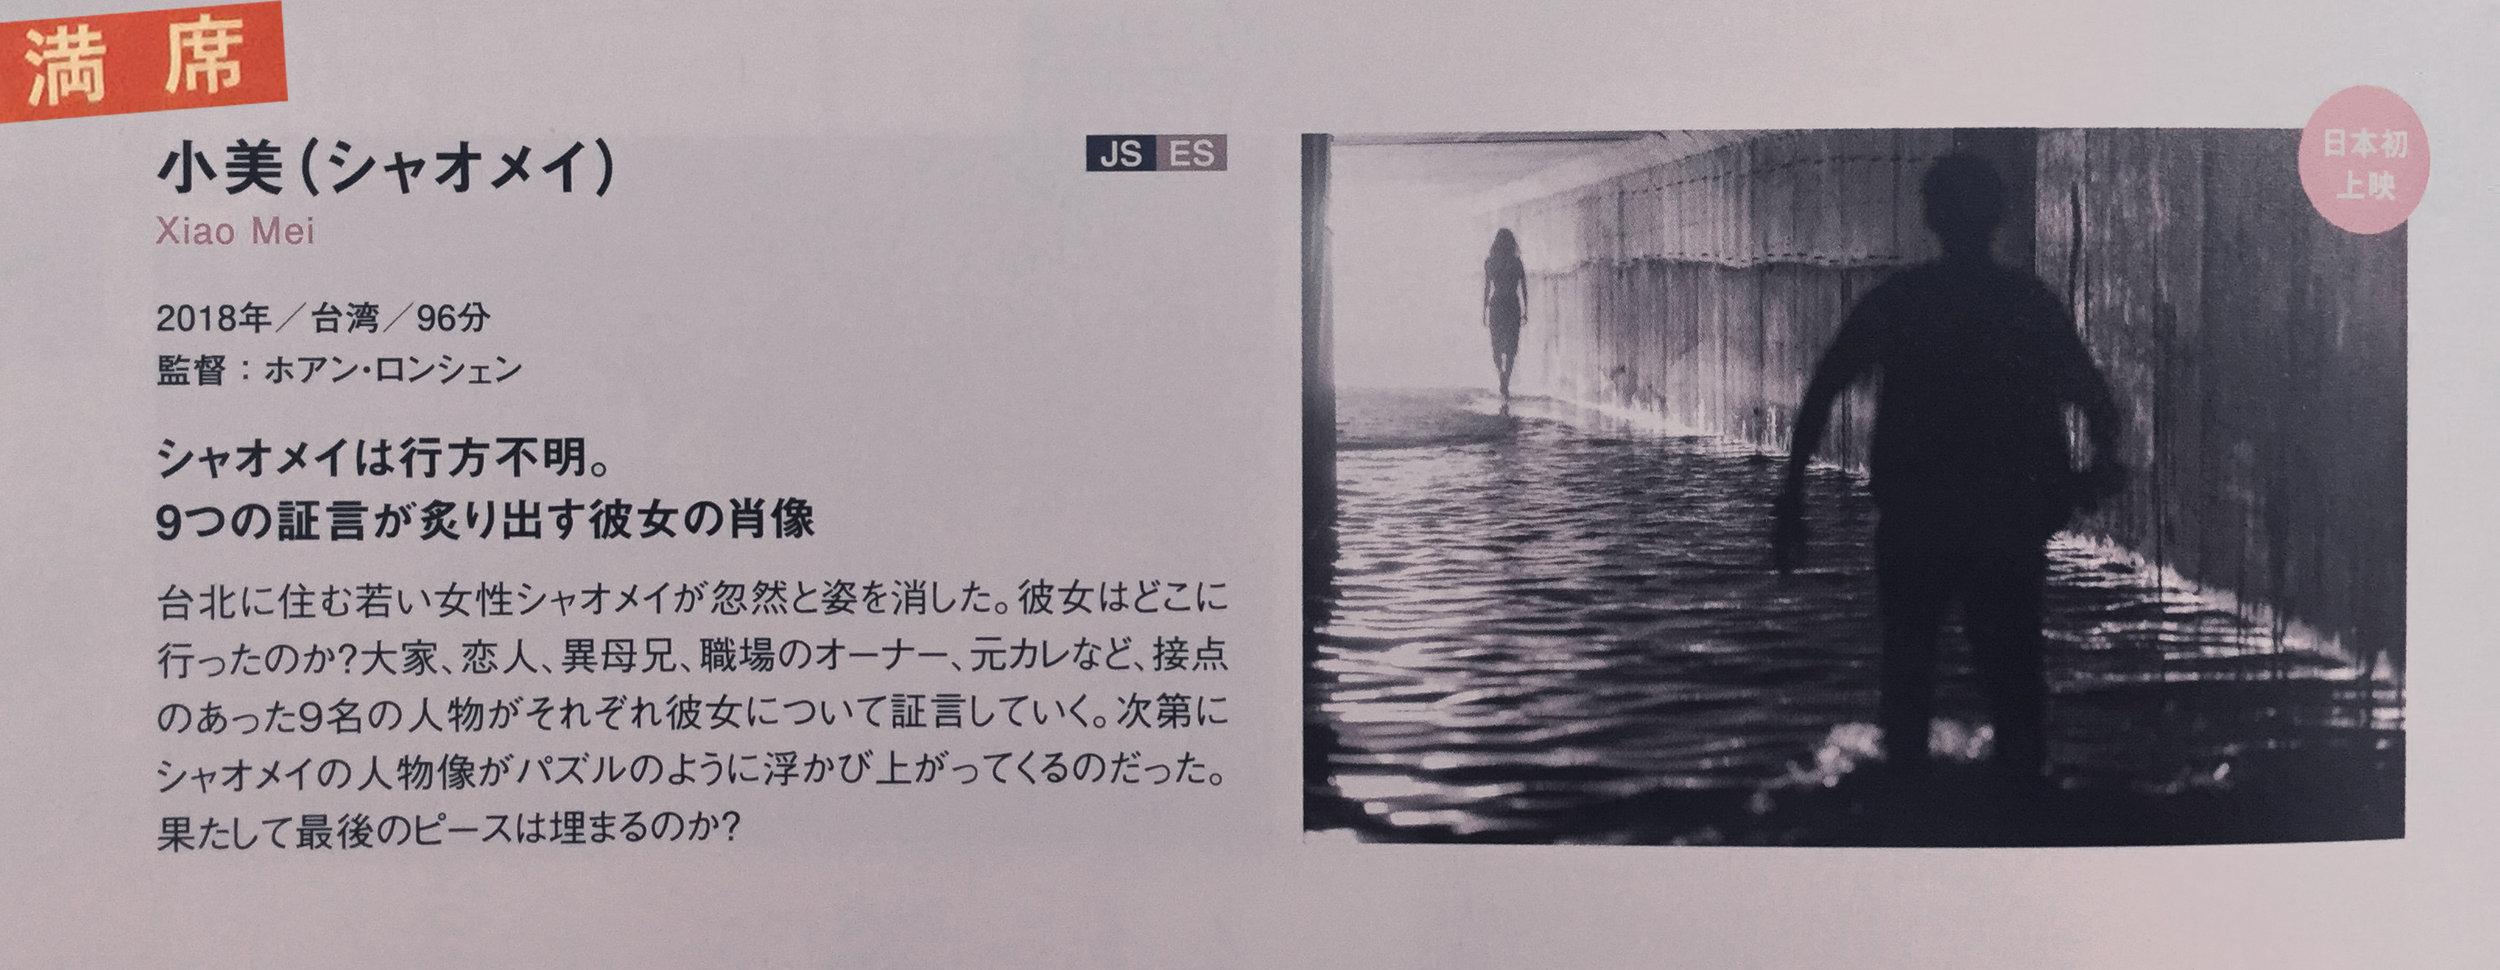 IMG_8753-1.jpg